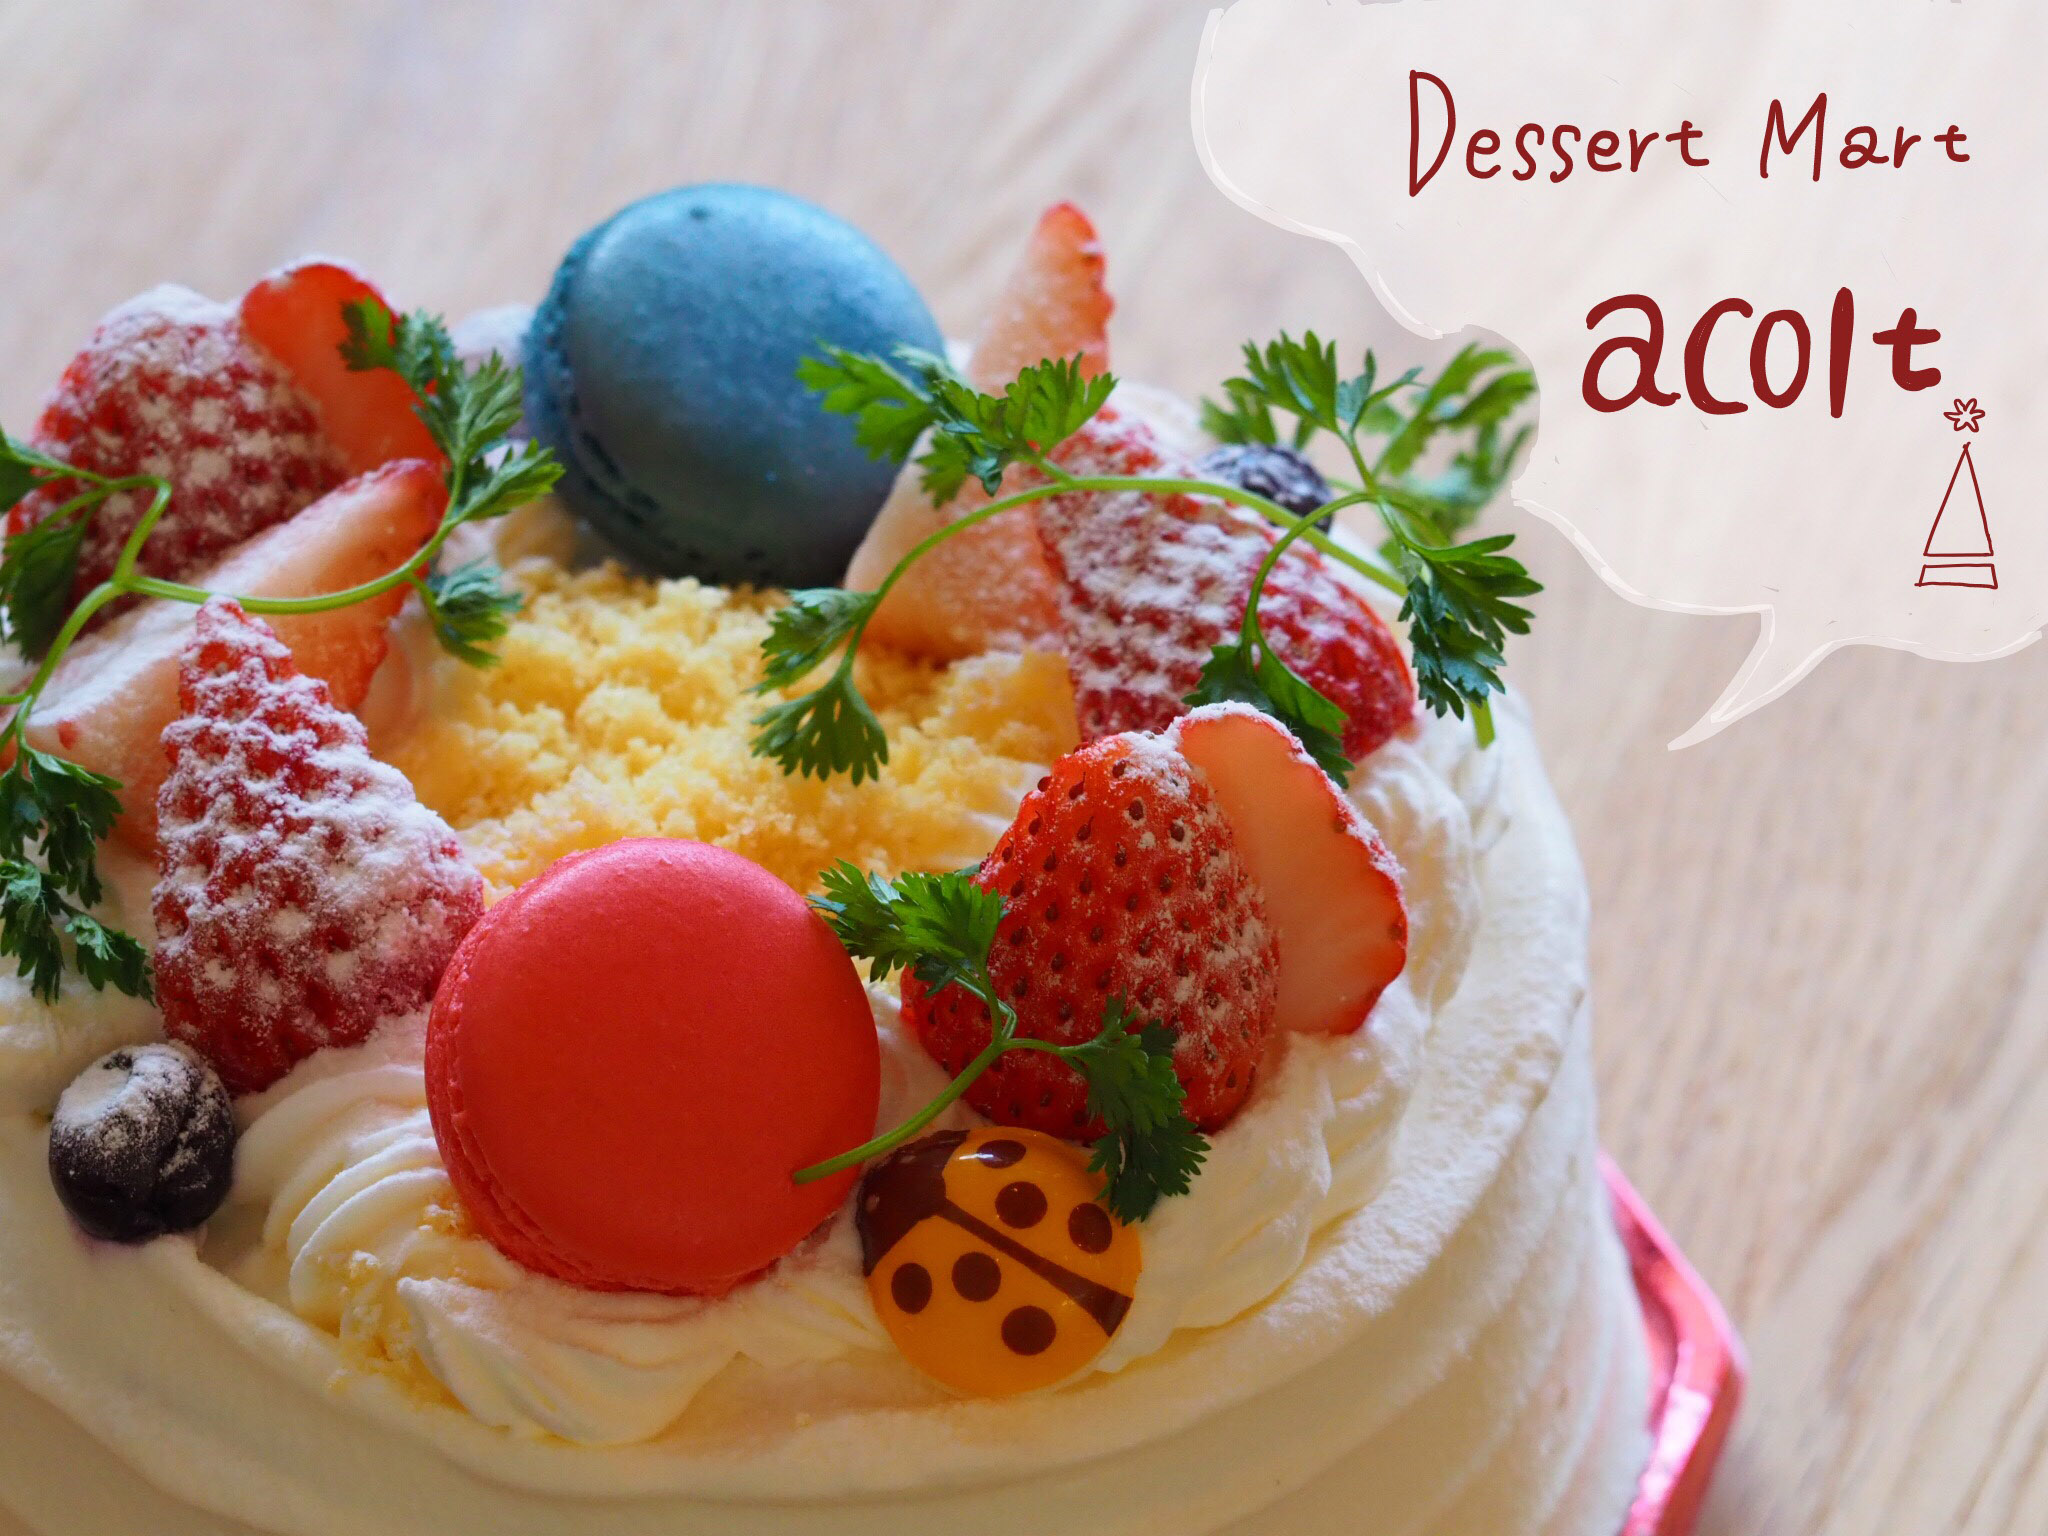 Dessert Mart acolt